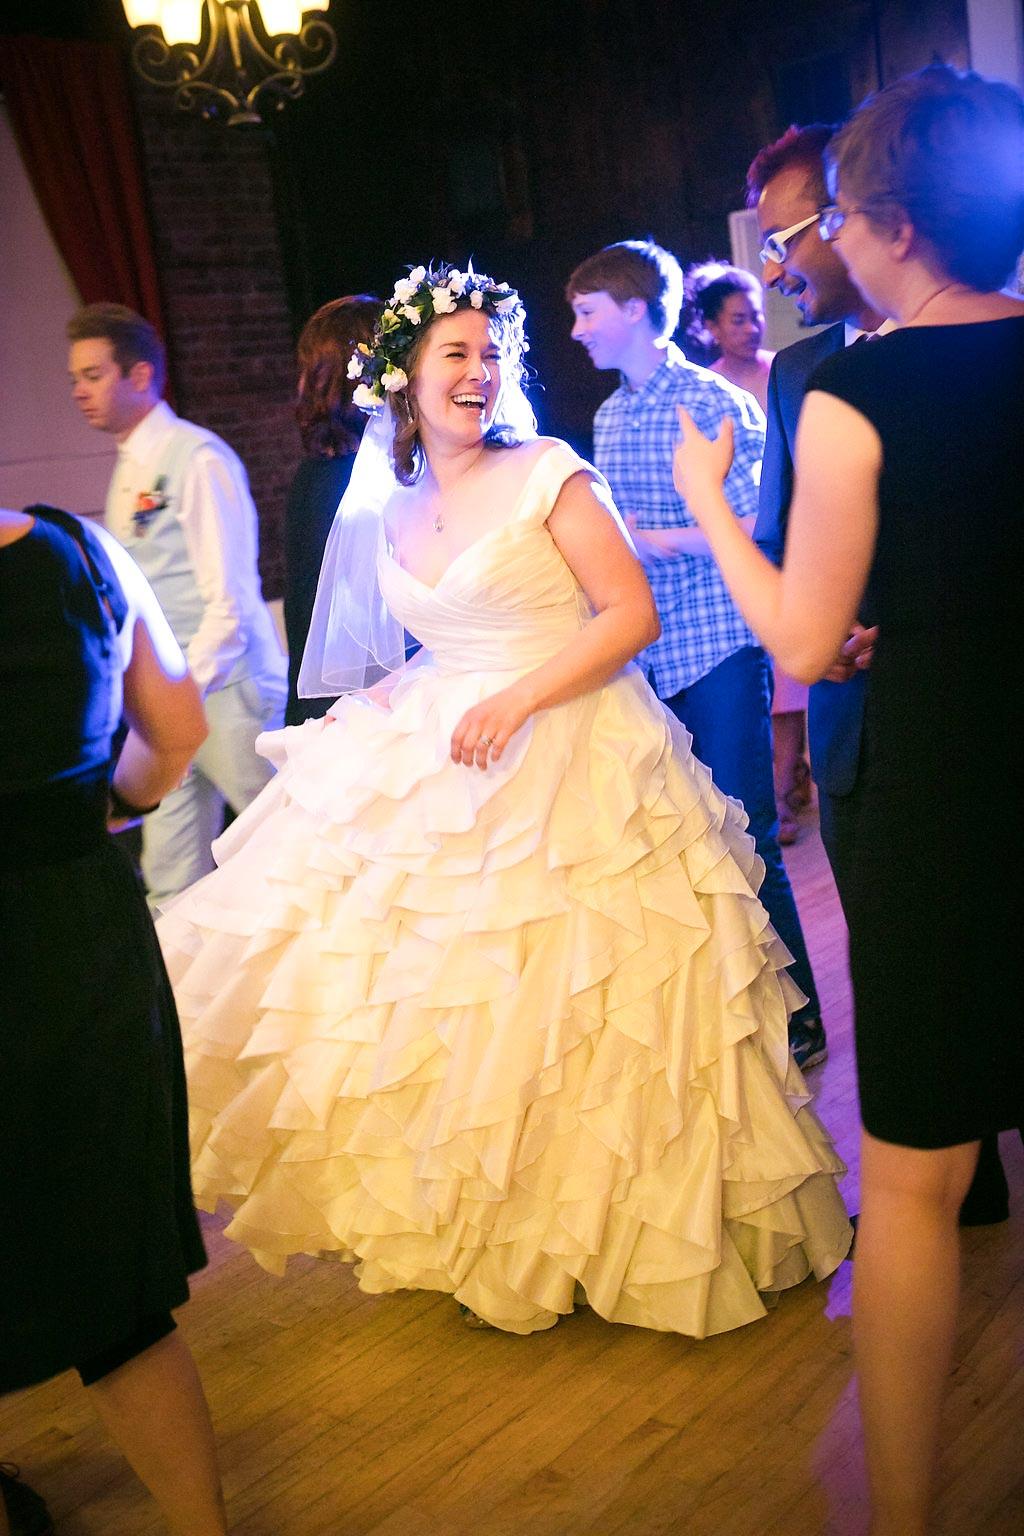 Seattle_KerryPark_Wedding-92.jpg